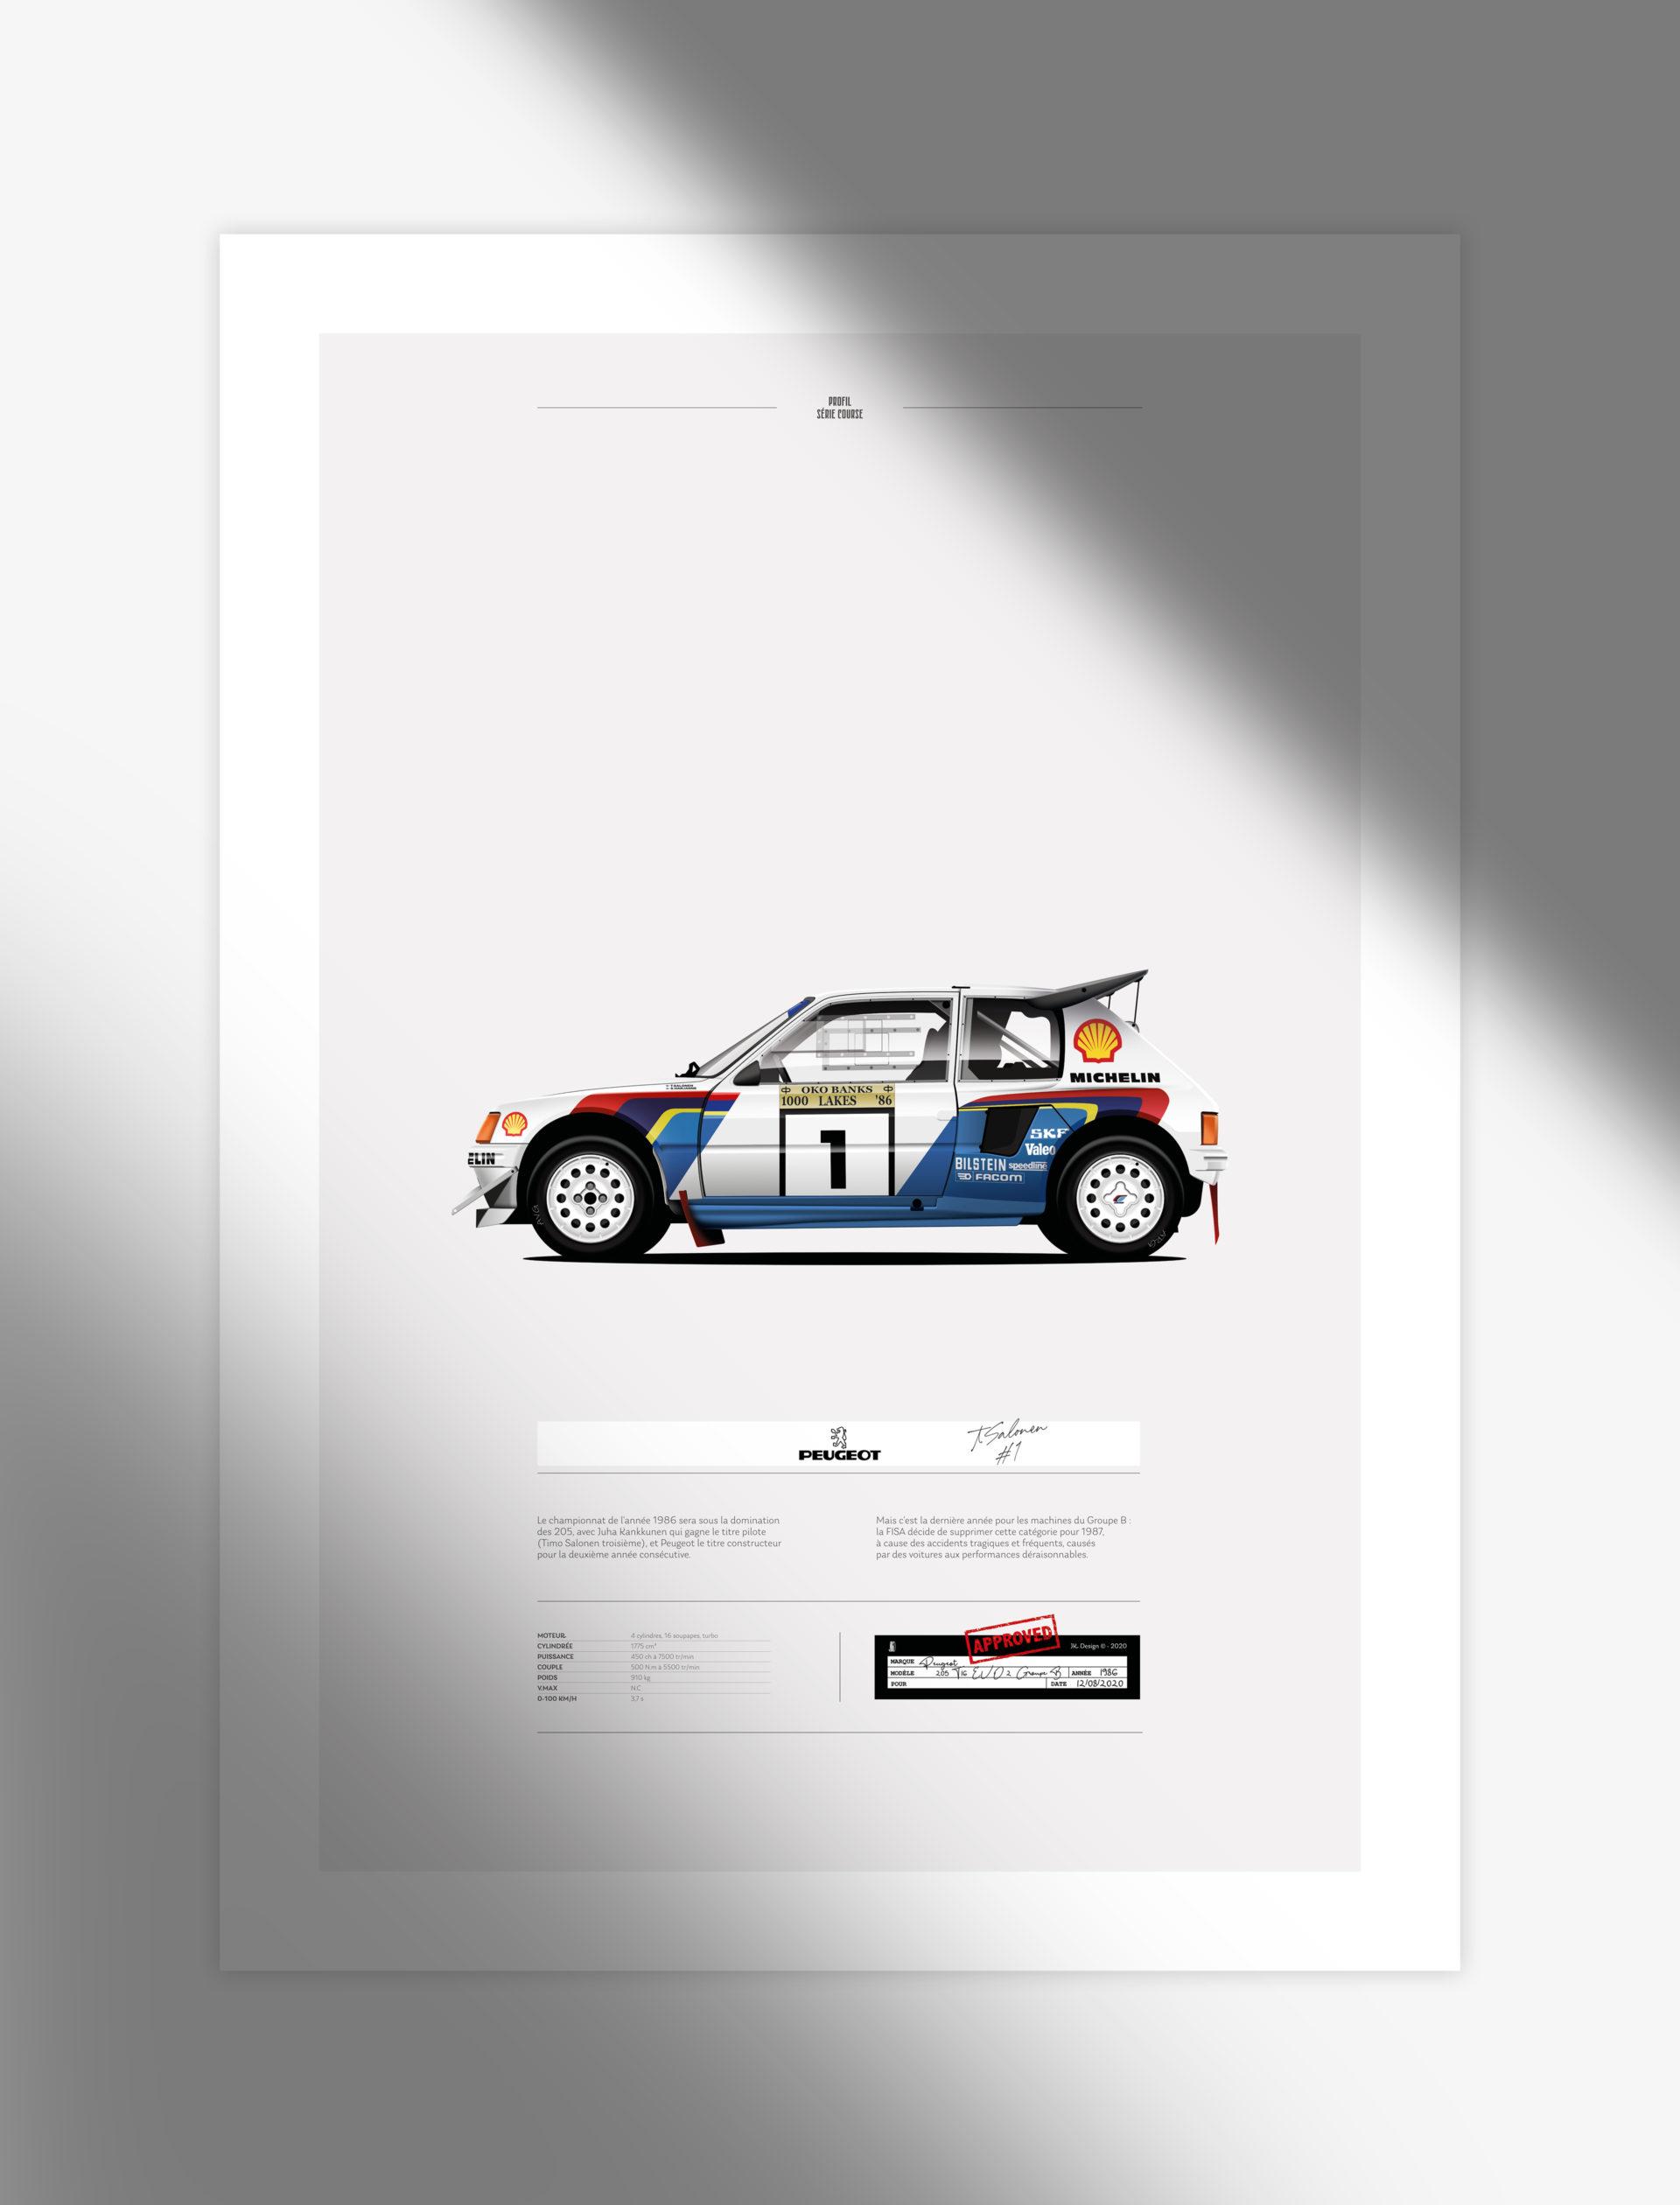 Jk Design - 50x70cm - 03